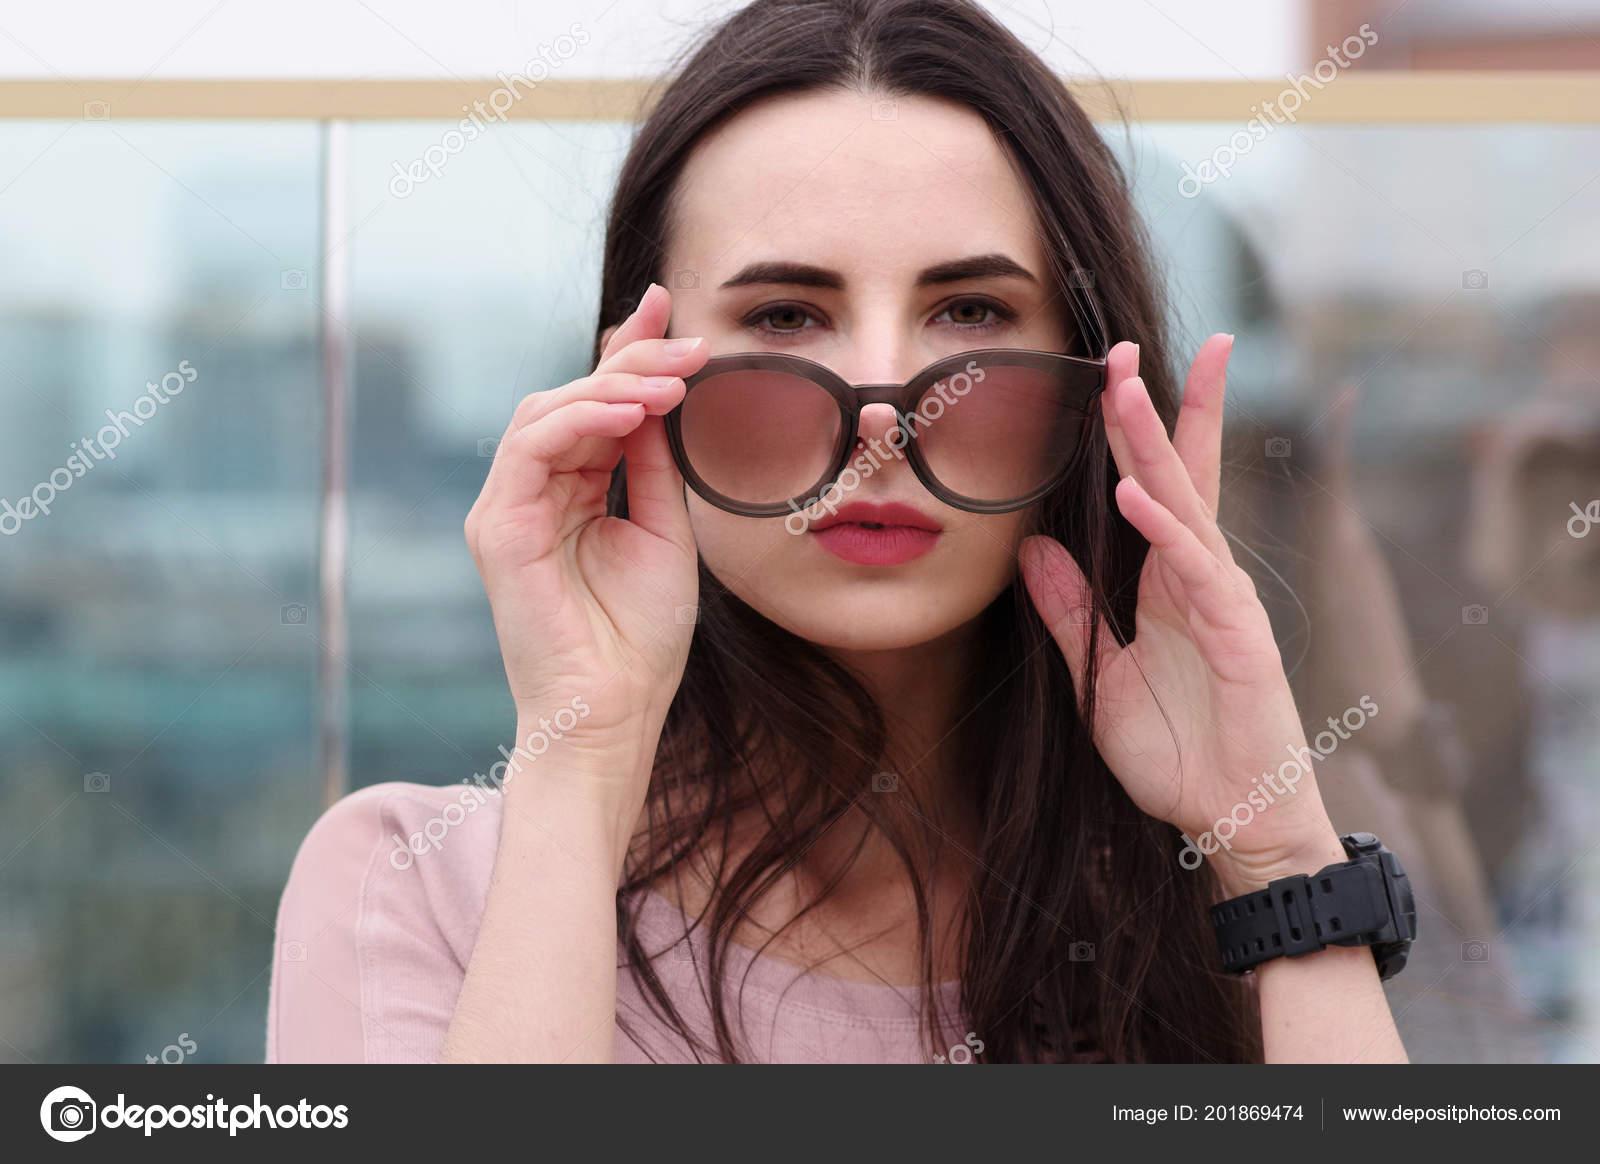 e943961012 Γκρο πλαν  μακρυμάλλης νεαρή γυναίκα μελαχρινή ποζάρουν παίζοντας με γυαλιά  ηλίου. Μοντέρνο στυλ με ροζ τόνους. Θολή φόντο. Ο αγέρας παίζει με τα  μαλλιά ...